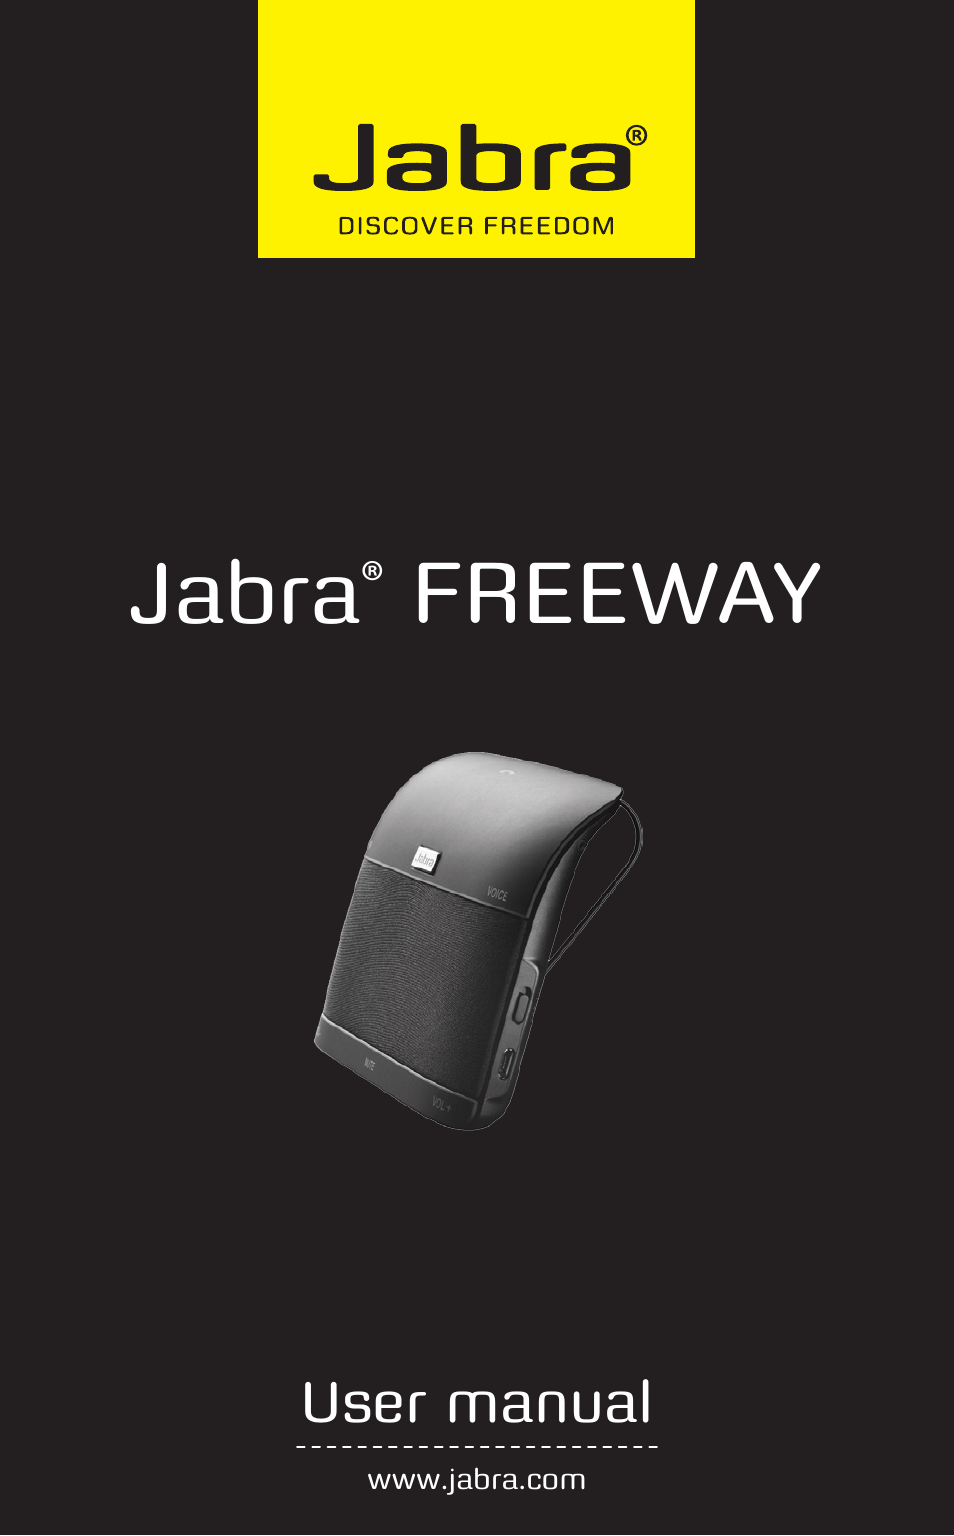 Jabra HFS100 User Manual - Page 1 of 21   Manualsbrain.com